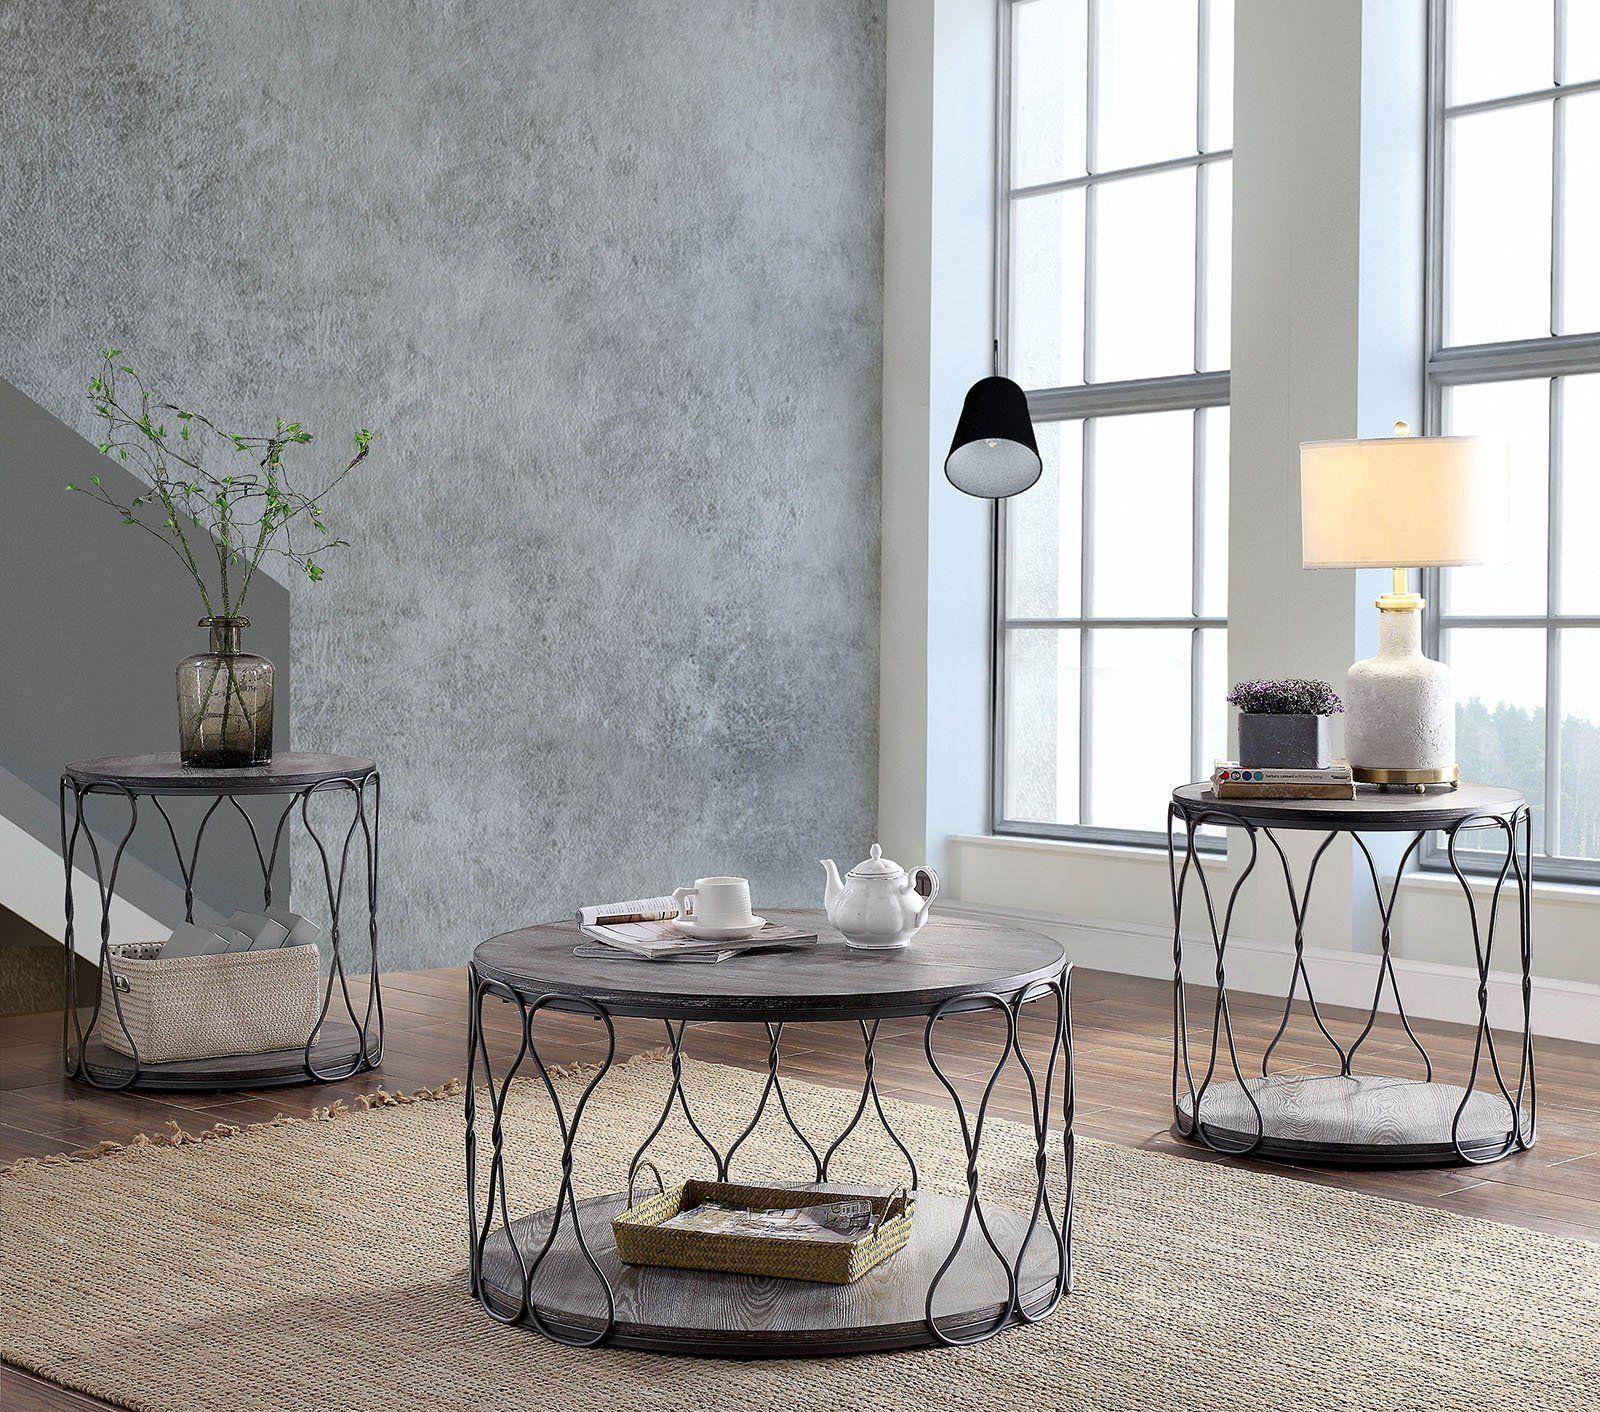 Steel And Wood Coffee Table Muebles Hierro Y Madera Muebles Estilo Industrial Mesas Madera Y Hierro [ 1200 x 1800 Pixel ]